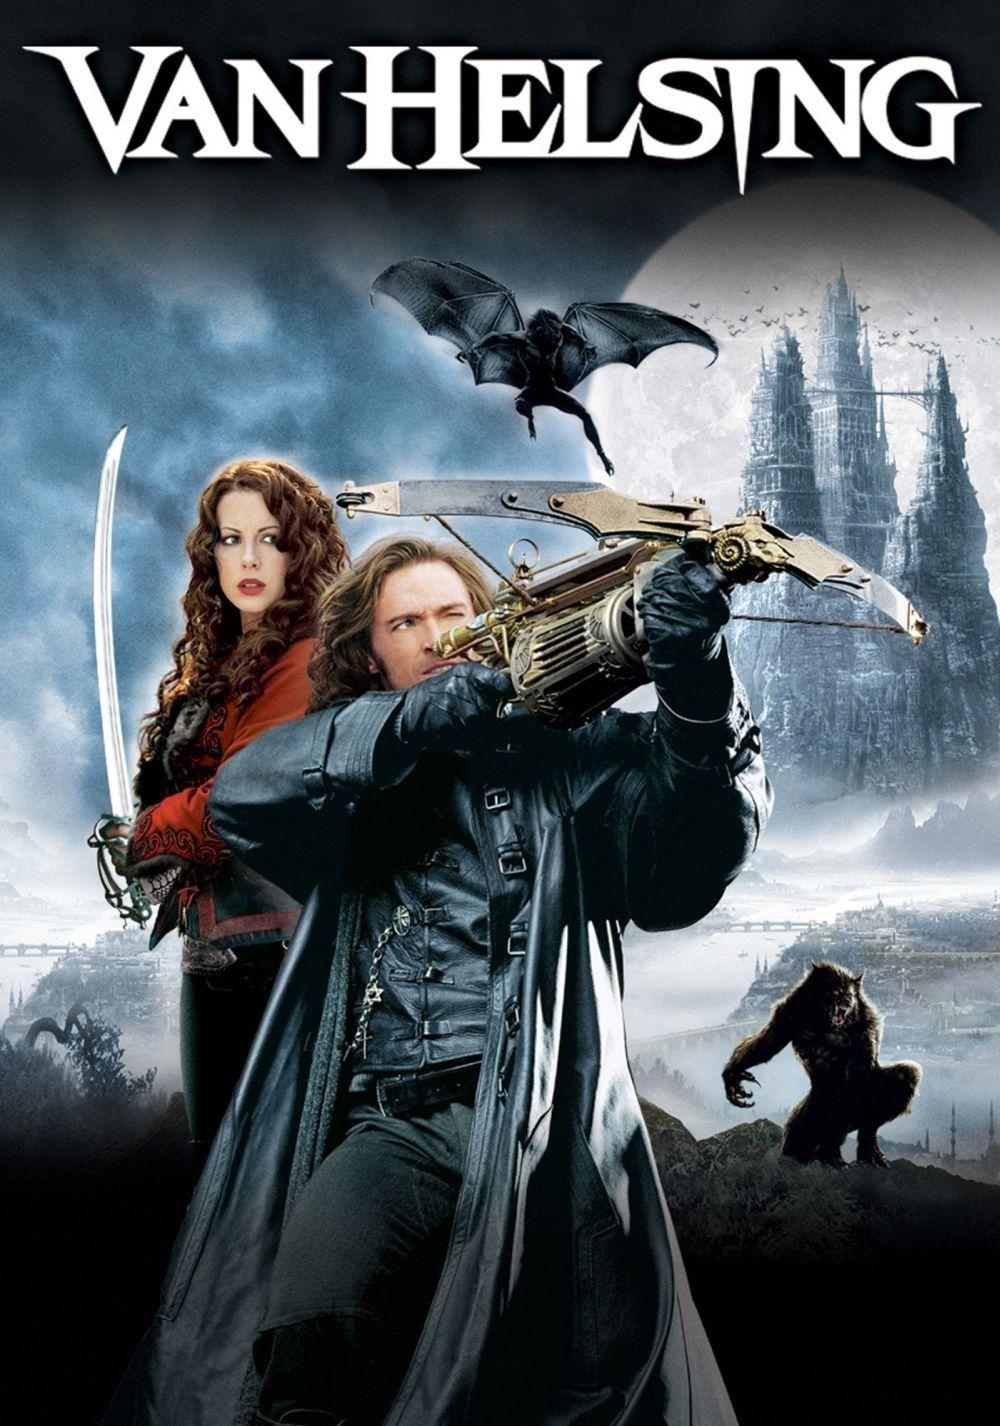 Van Helsing Review Legendary Monster Hunter Van Helsing Hugh Jackman Is Sent To Mysterious Transylvania From He Vampire Movies Love Movie Favorite Movies